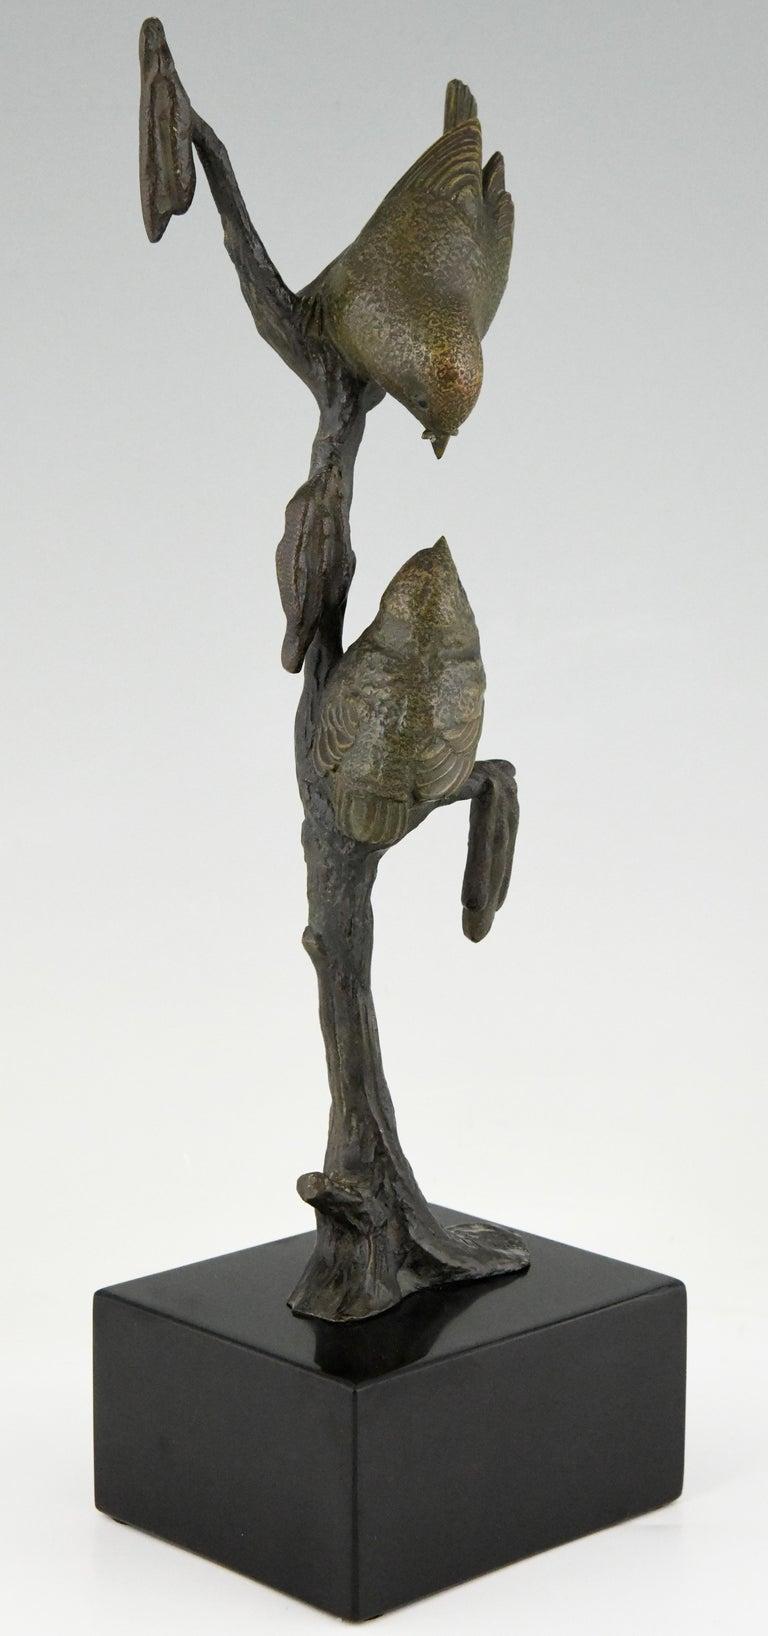 Art Deco Bronze Sculpture Two Birds on an Branch Irenee Rochard, France, 1930 For Sale 3